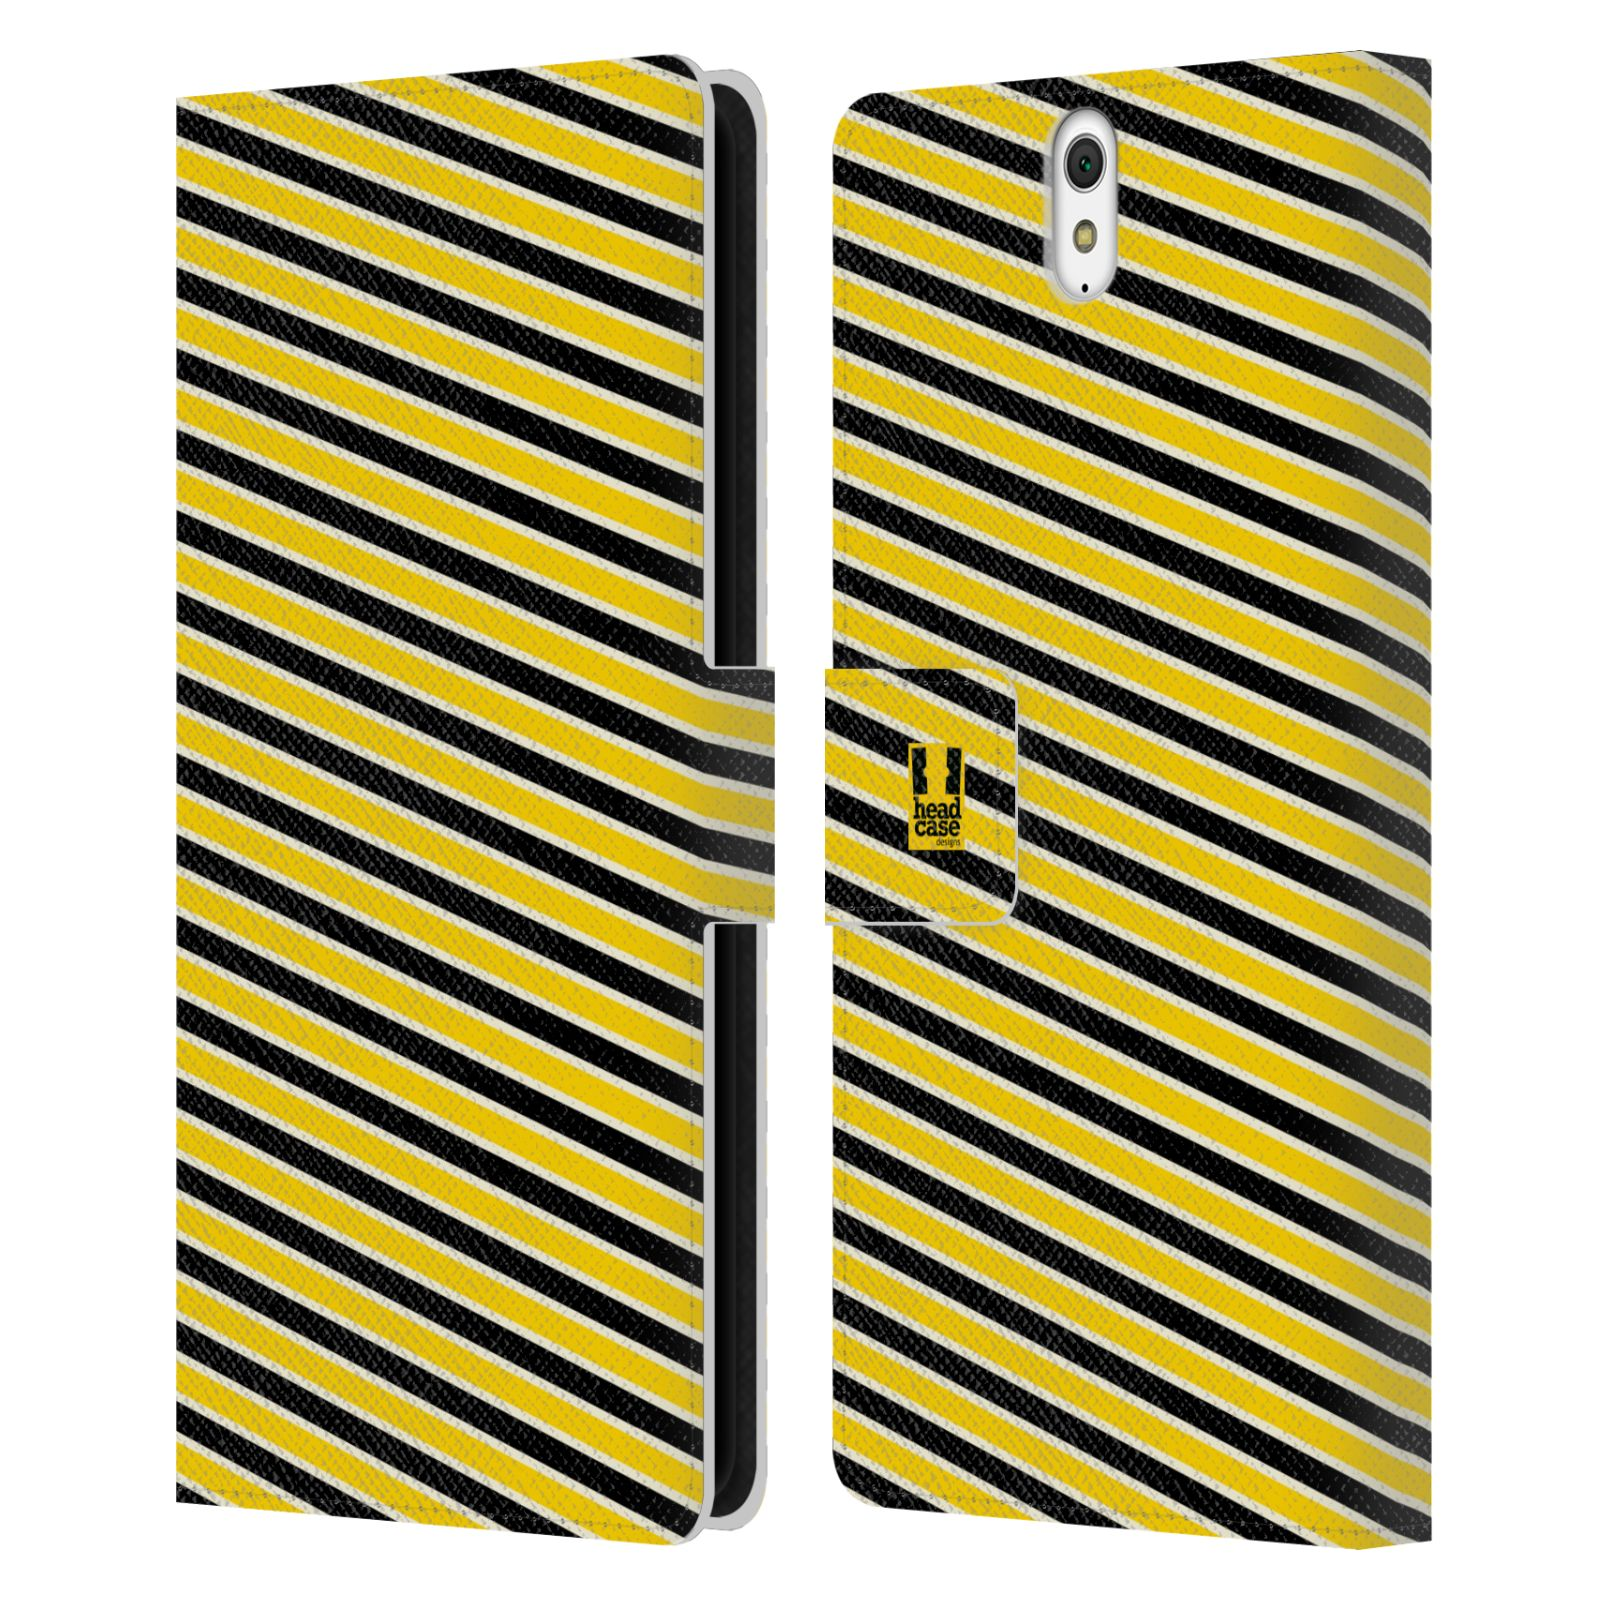 HEAD CASE Flipové pouzdro pro mobil SONY XPERIA C5 Ultra VČELÍ VZOR pruhy žlutá a černá